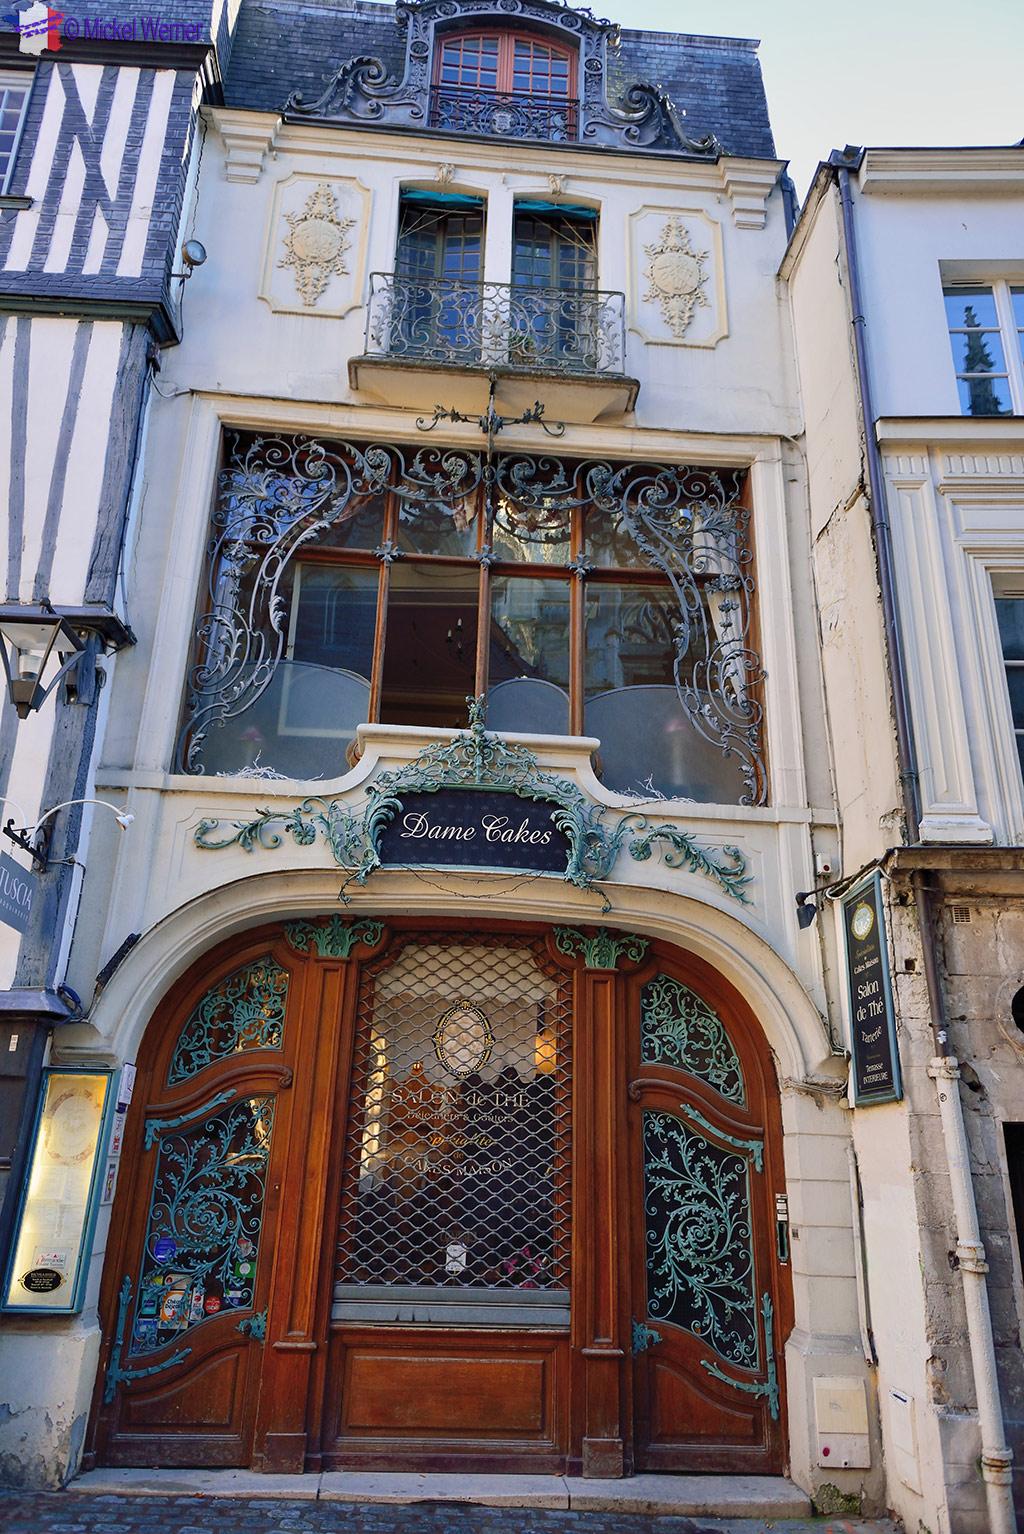 Rouen – Restaurants – Dame Cakes